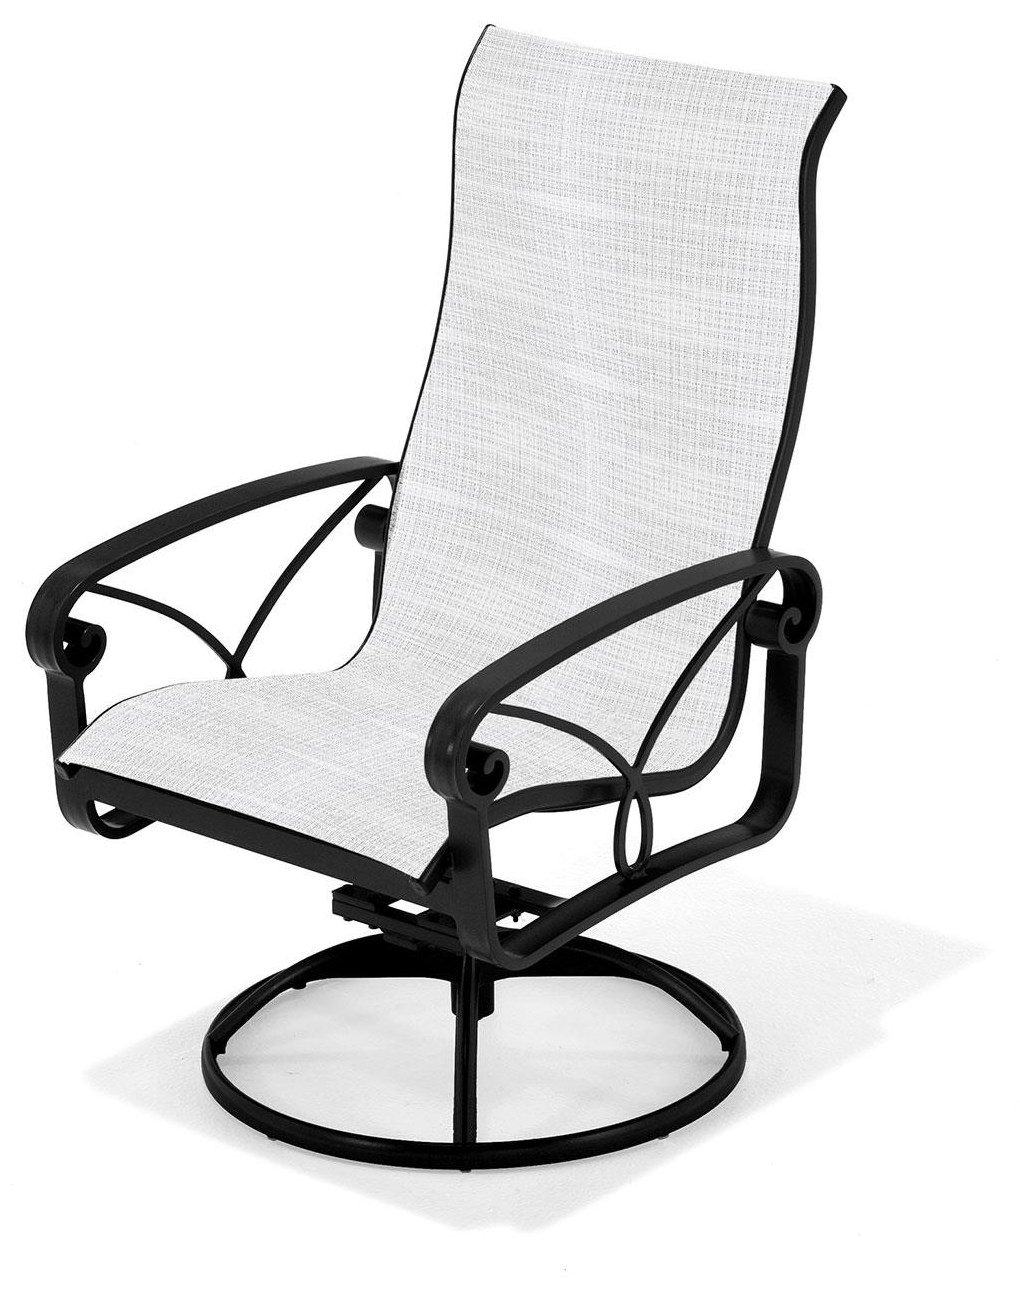 Palazzo Sling Ultra High Back Swivel Chair by Winston at Johnny Janosik